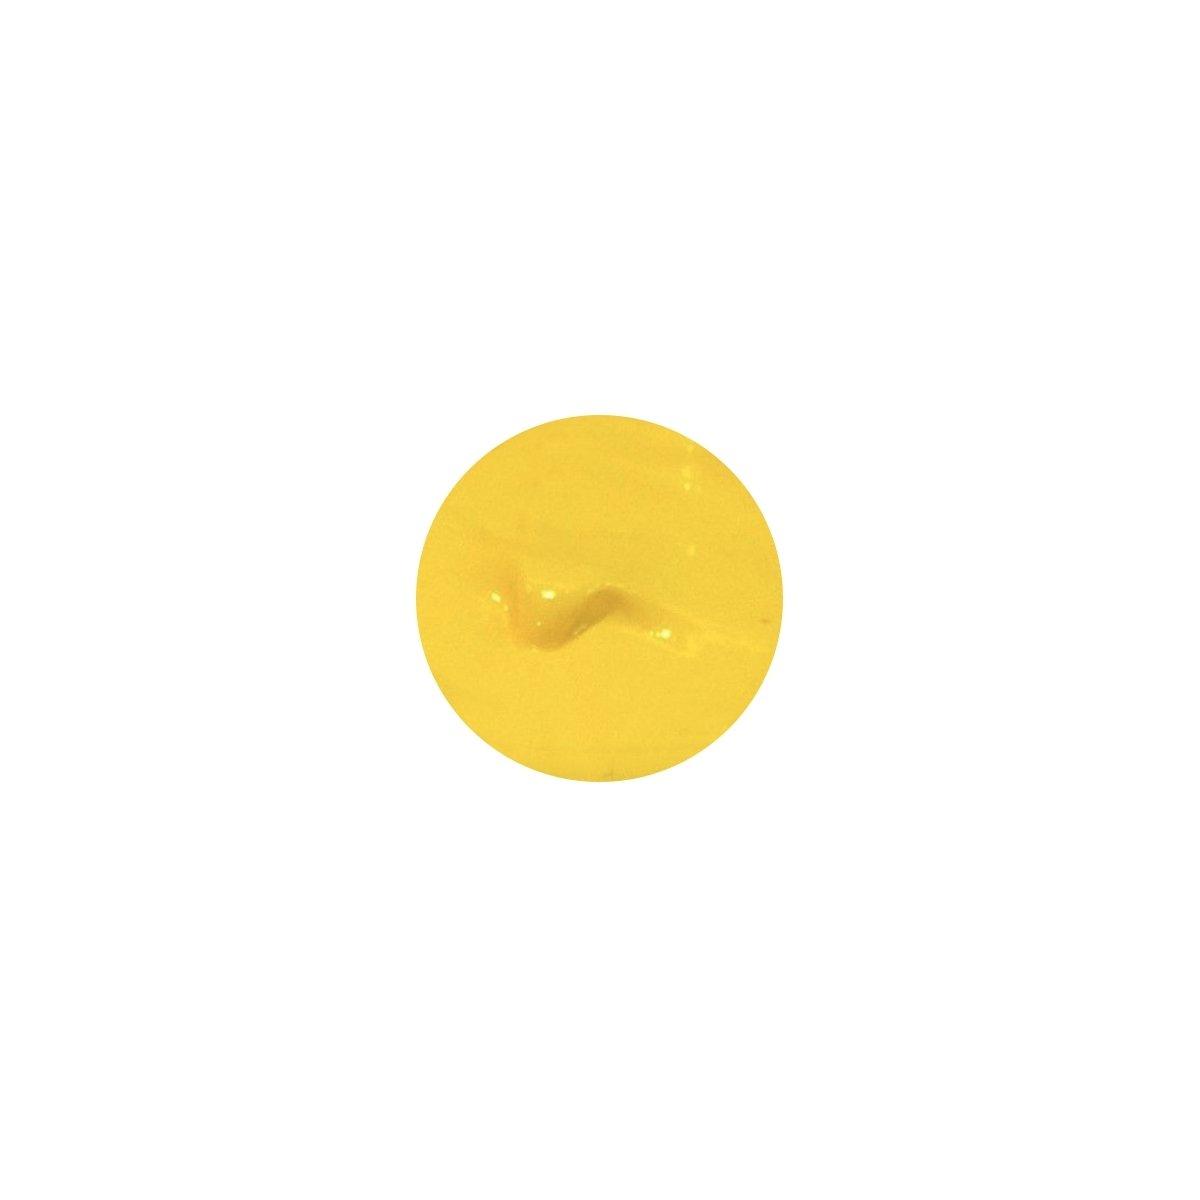 Tinta Genesis Yellow - 4 gramas ou 8 gramas